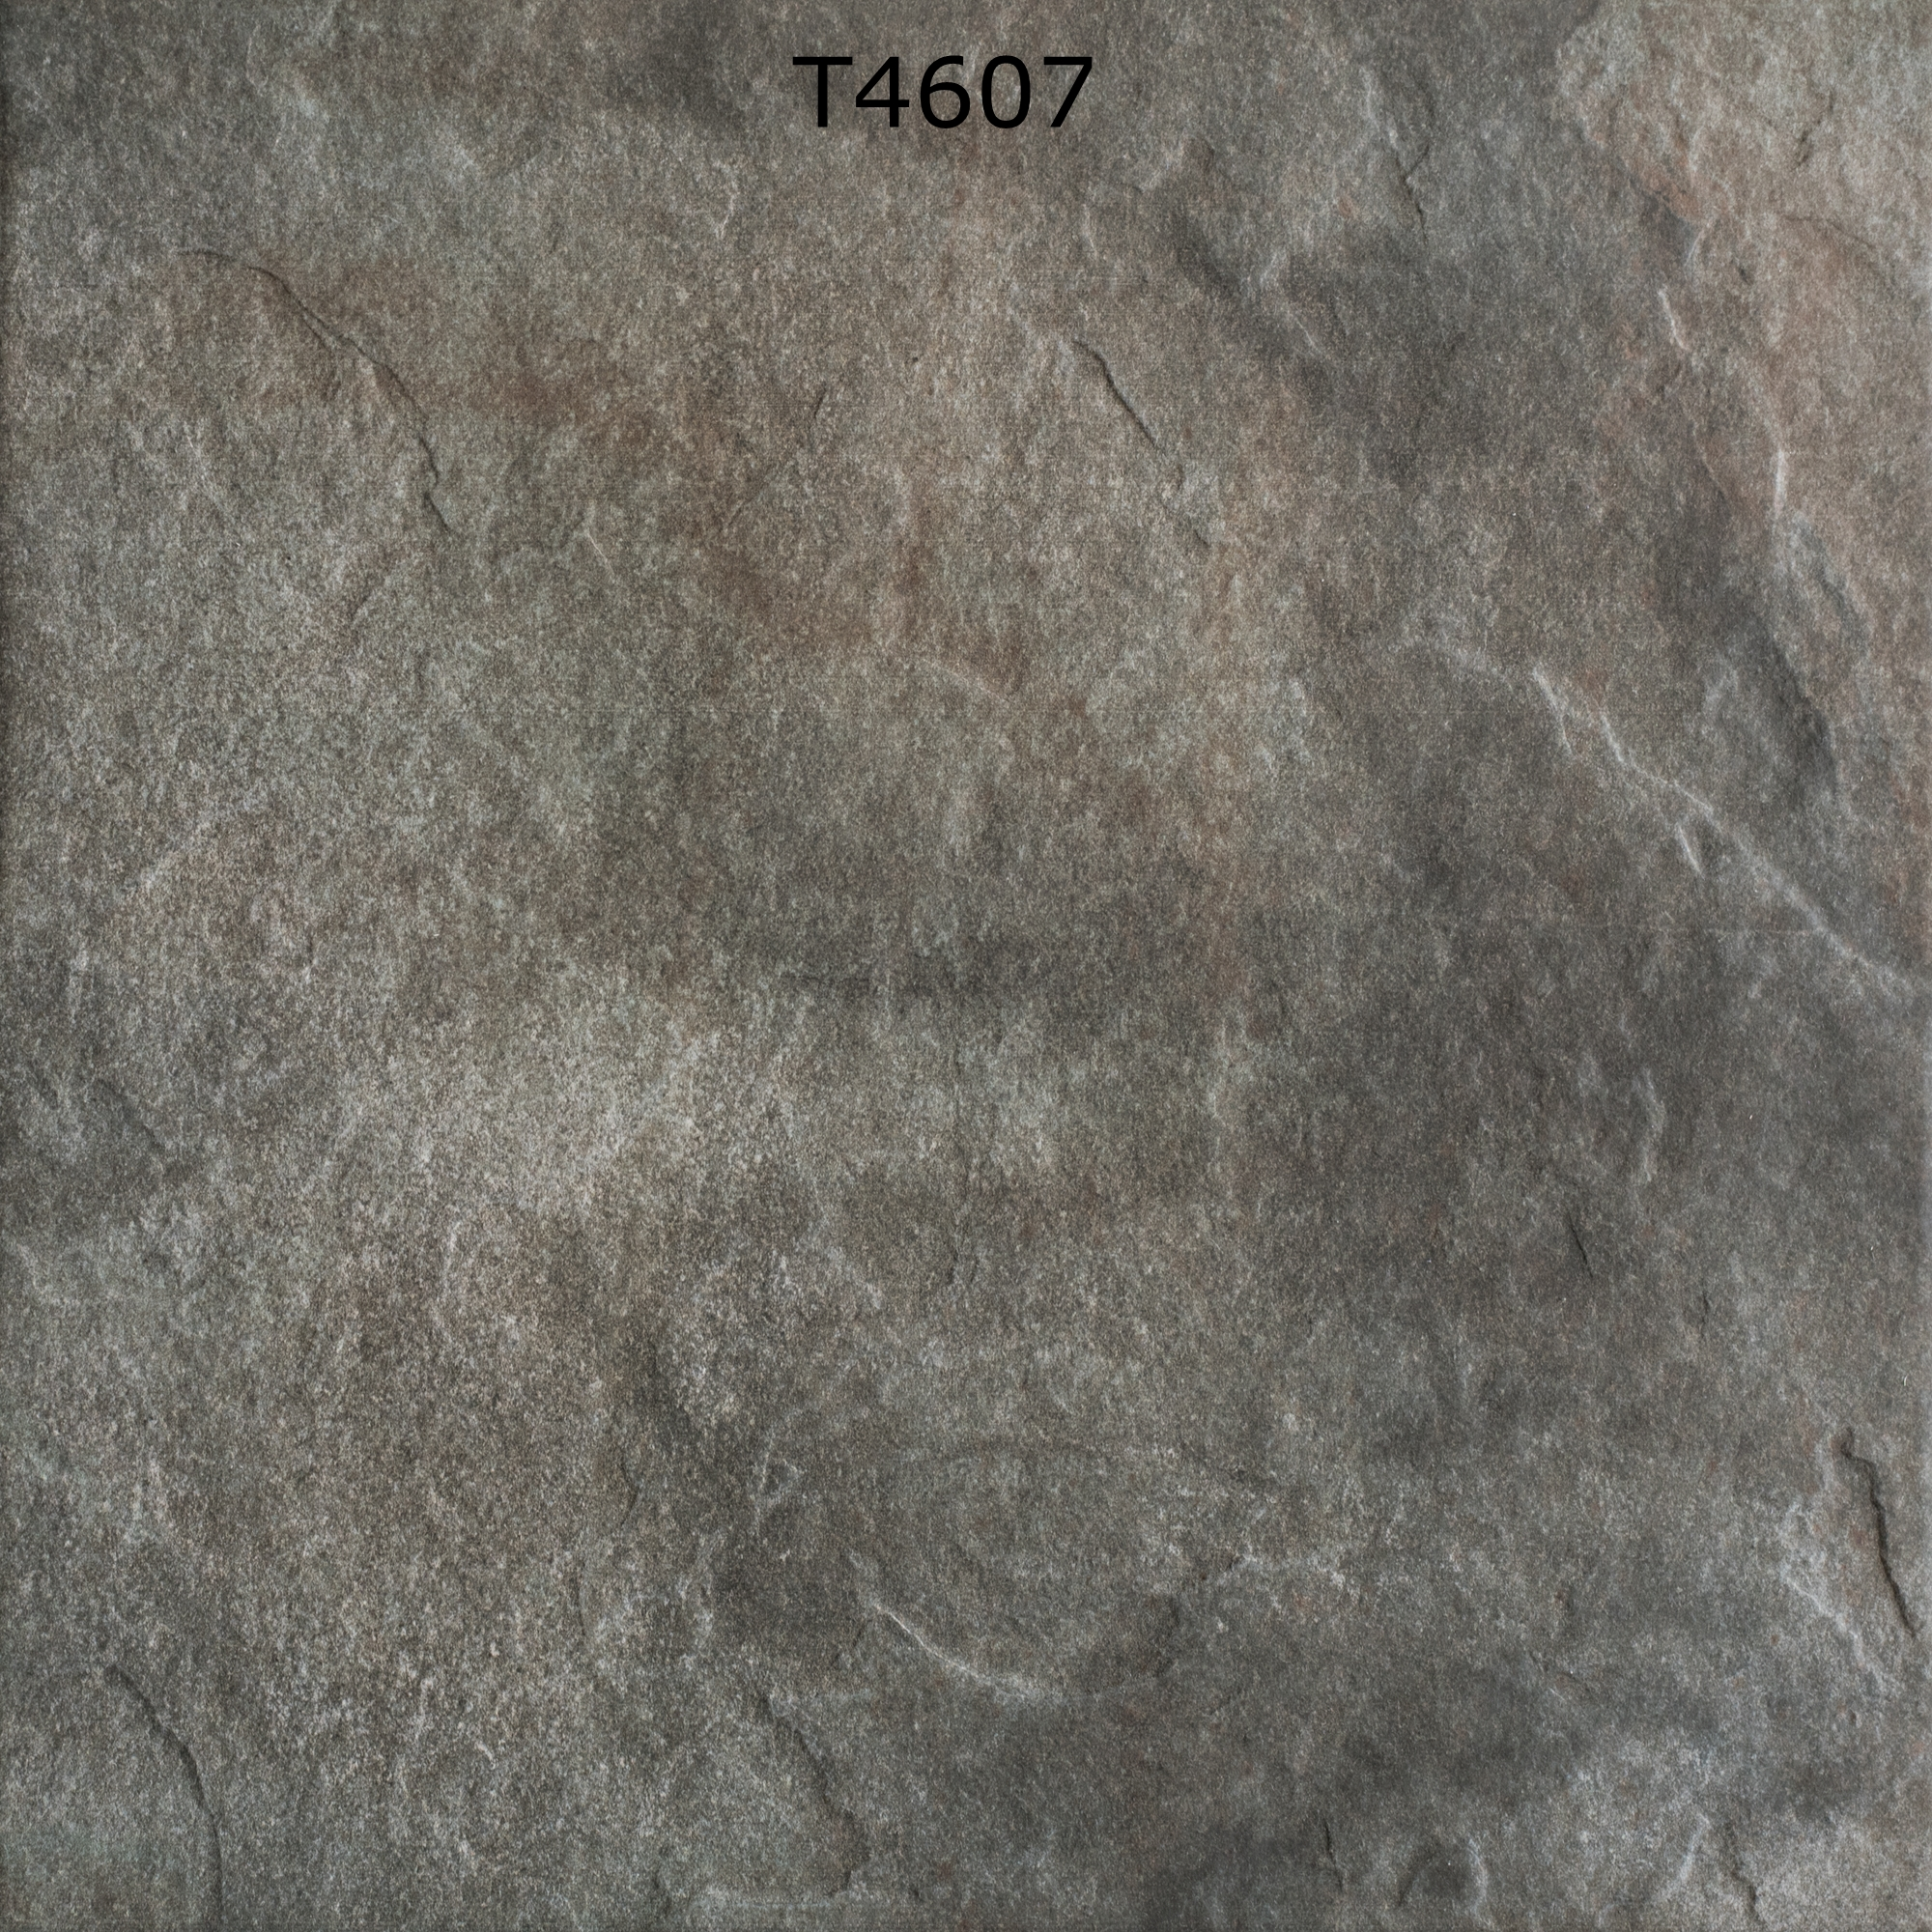 T4607